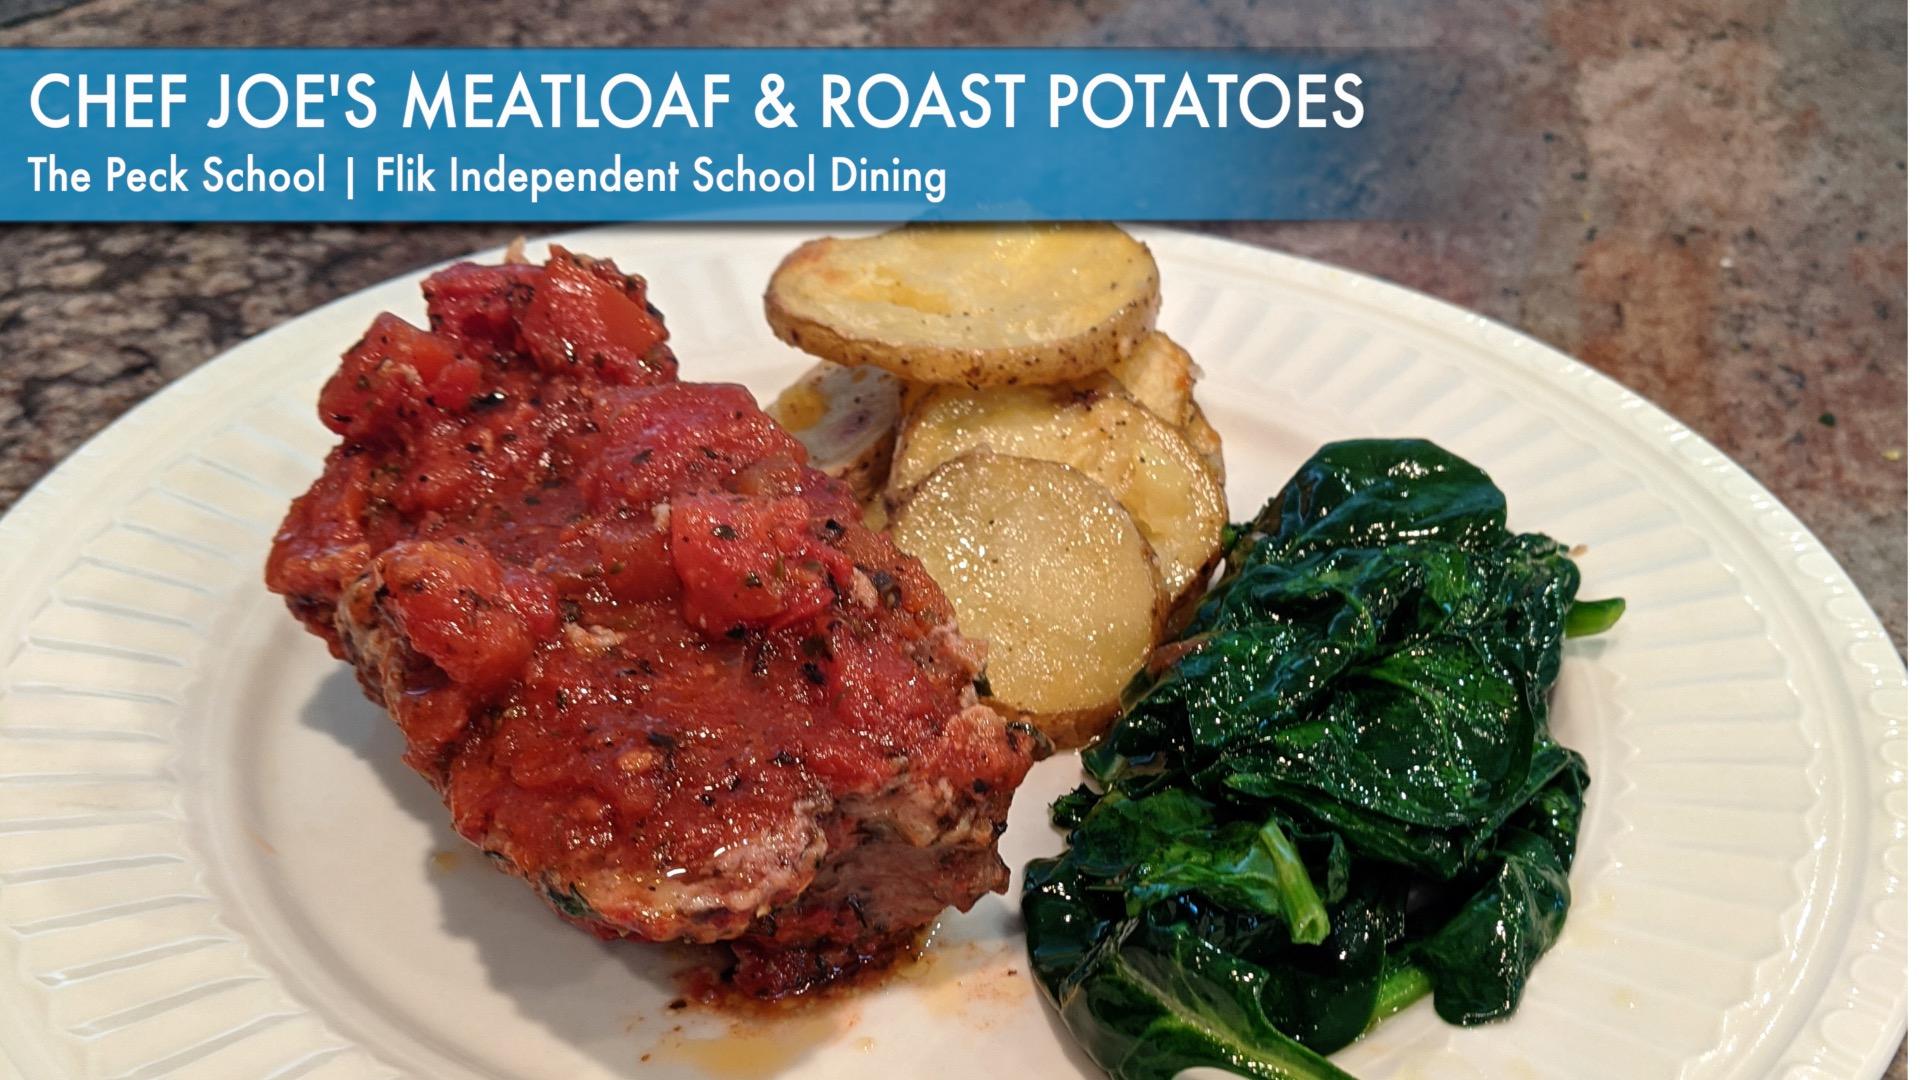 Chef Joes Meatloaf & Roast Potatoes